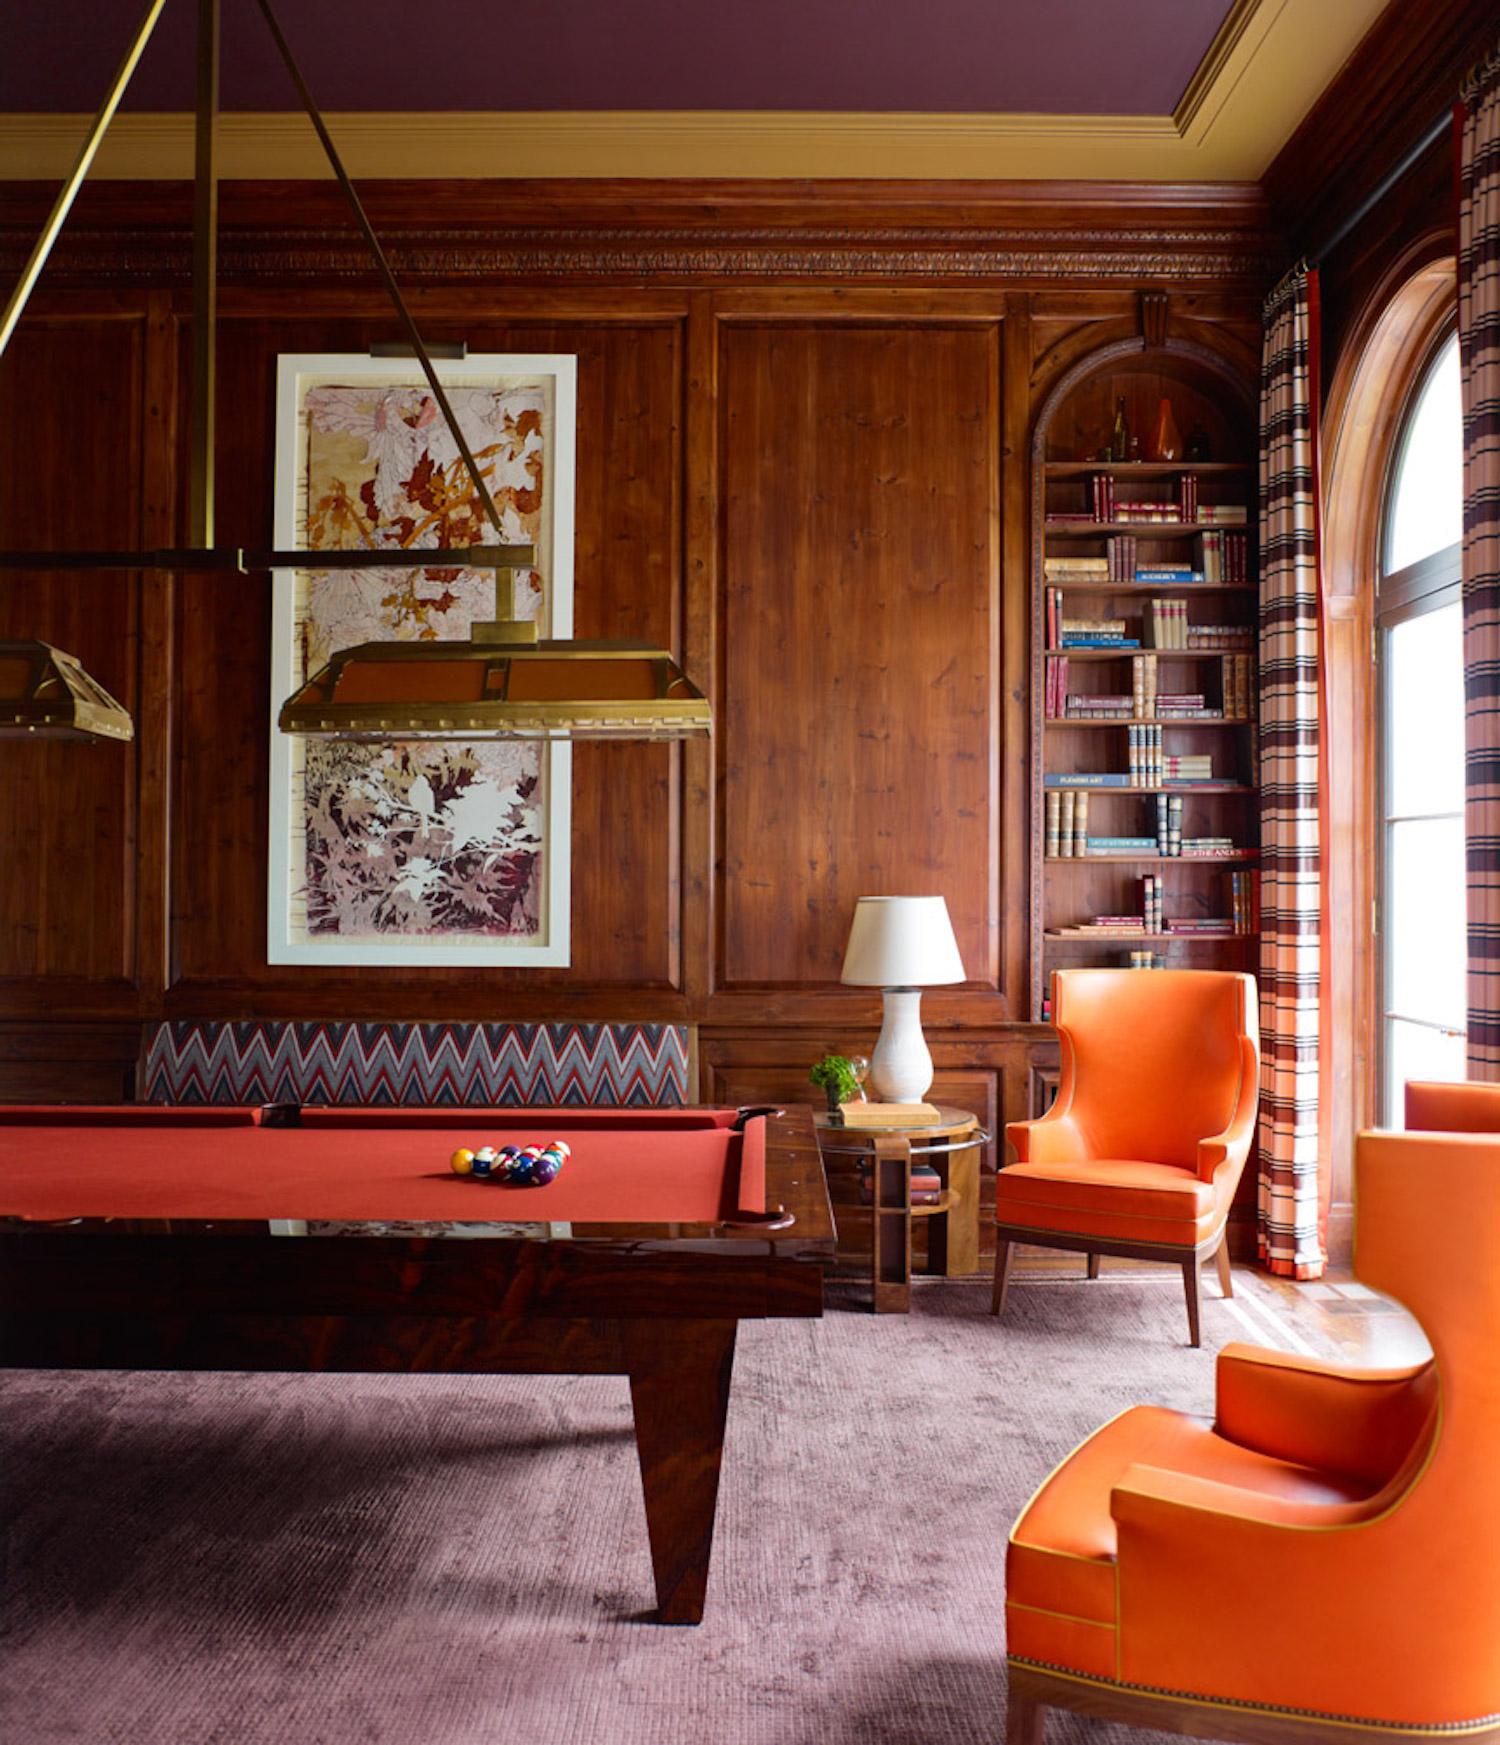 0901_billiard room 1.jpg